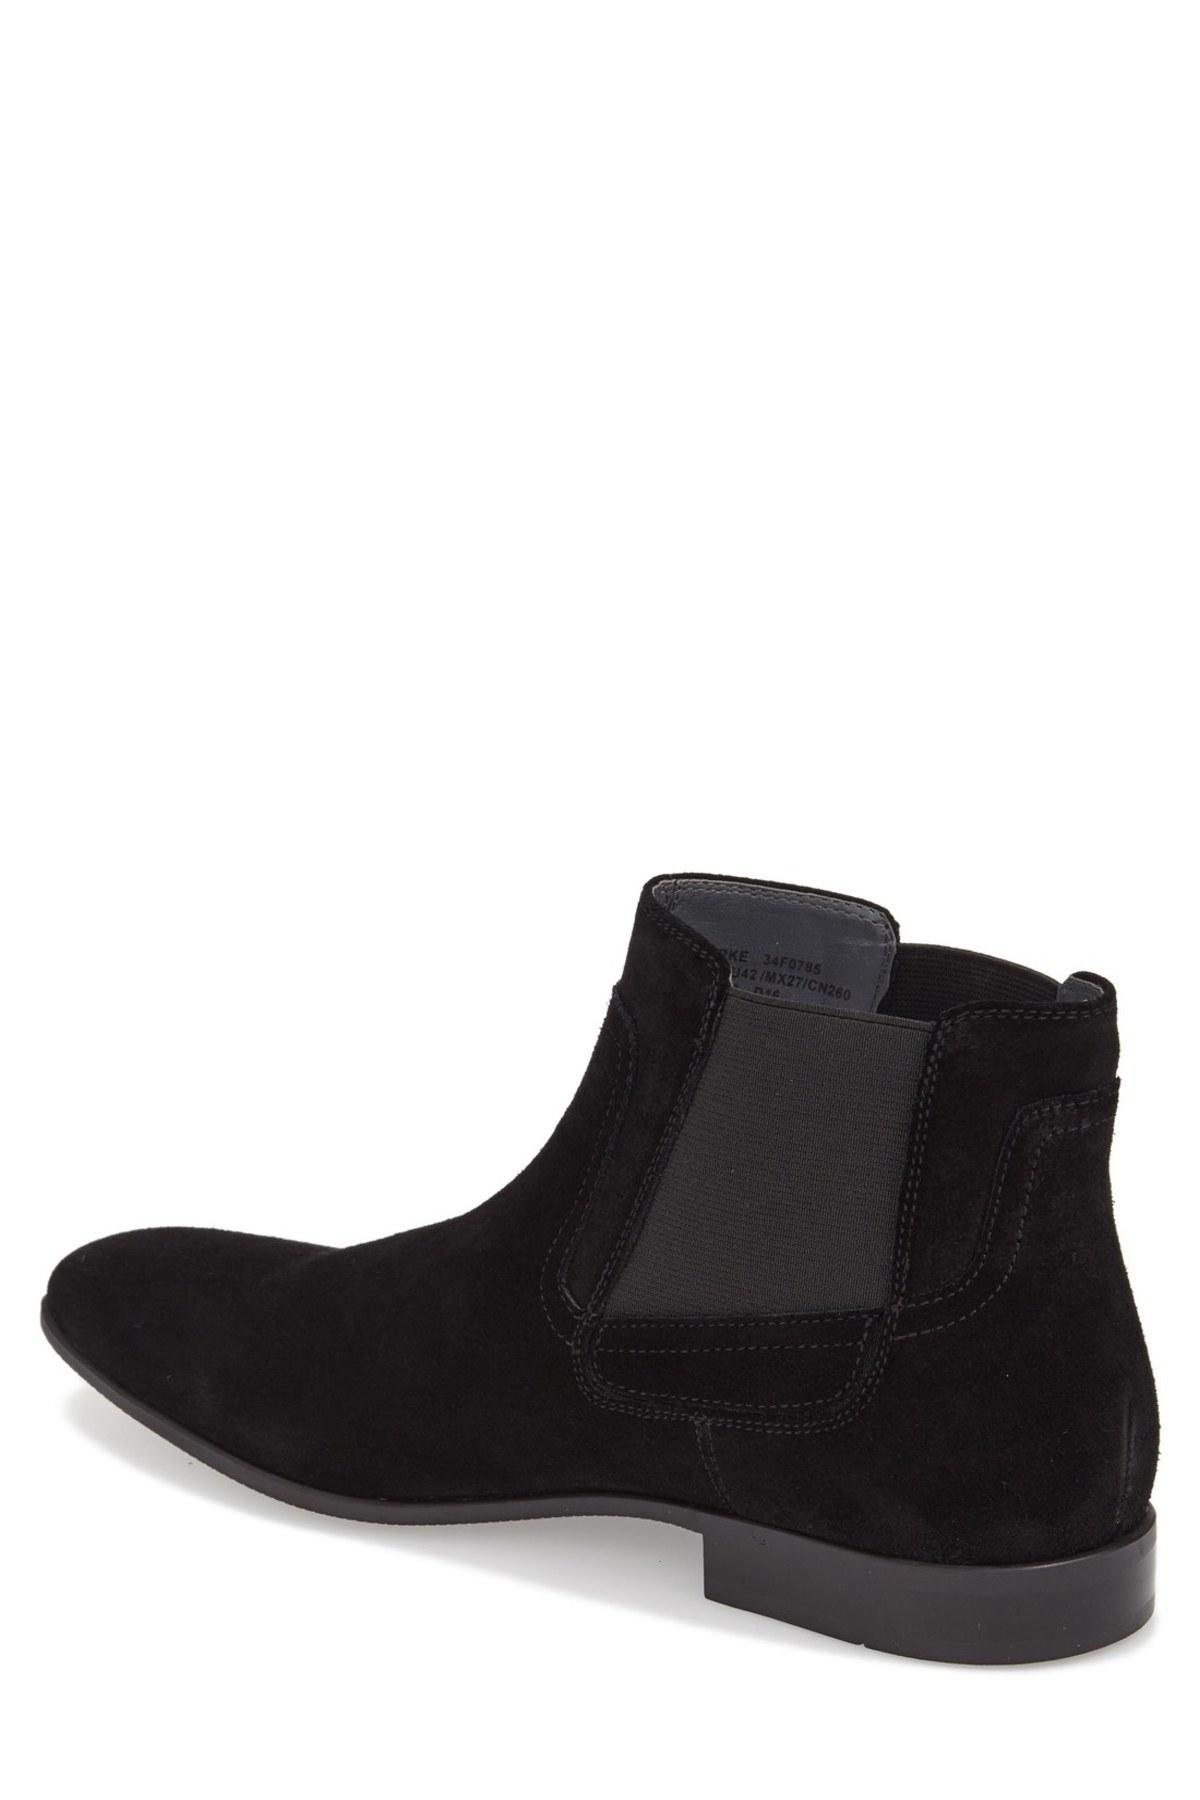 Calvin Klein Clarke Mid Chelsea Boot In Black For Men Lyst